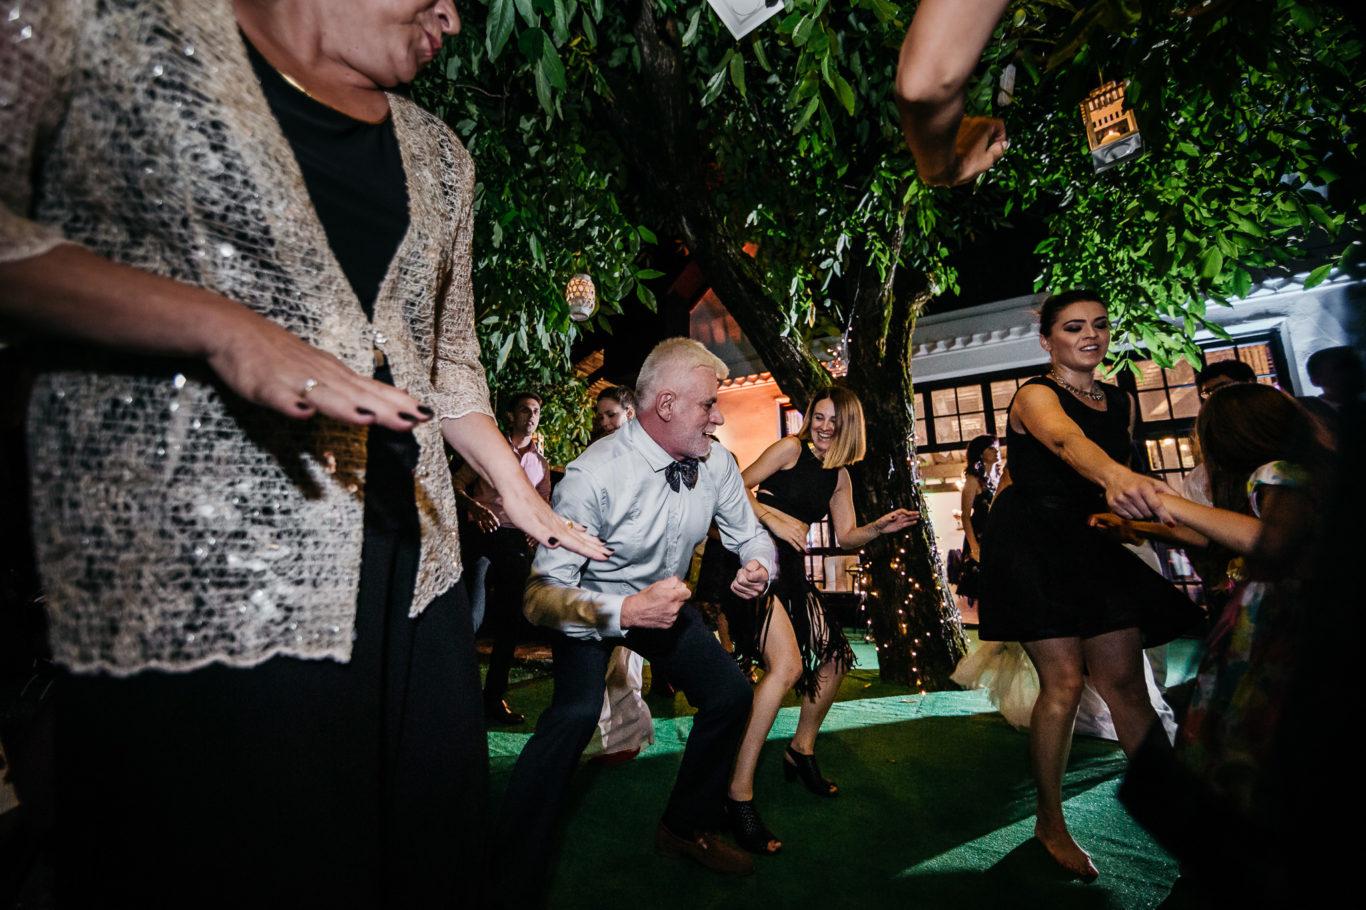 0560-fotoreportaj-nunta-conacul-maldar-cristina-stefan-fotograf-ciprian-dumitrescu-cd2_3860